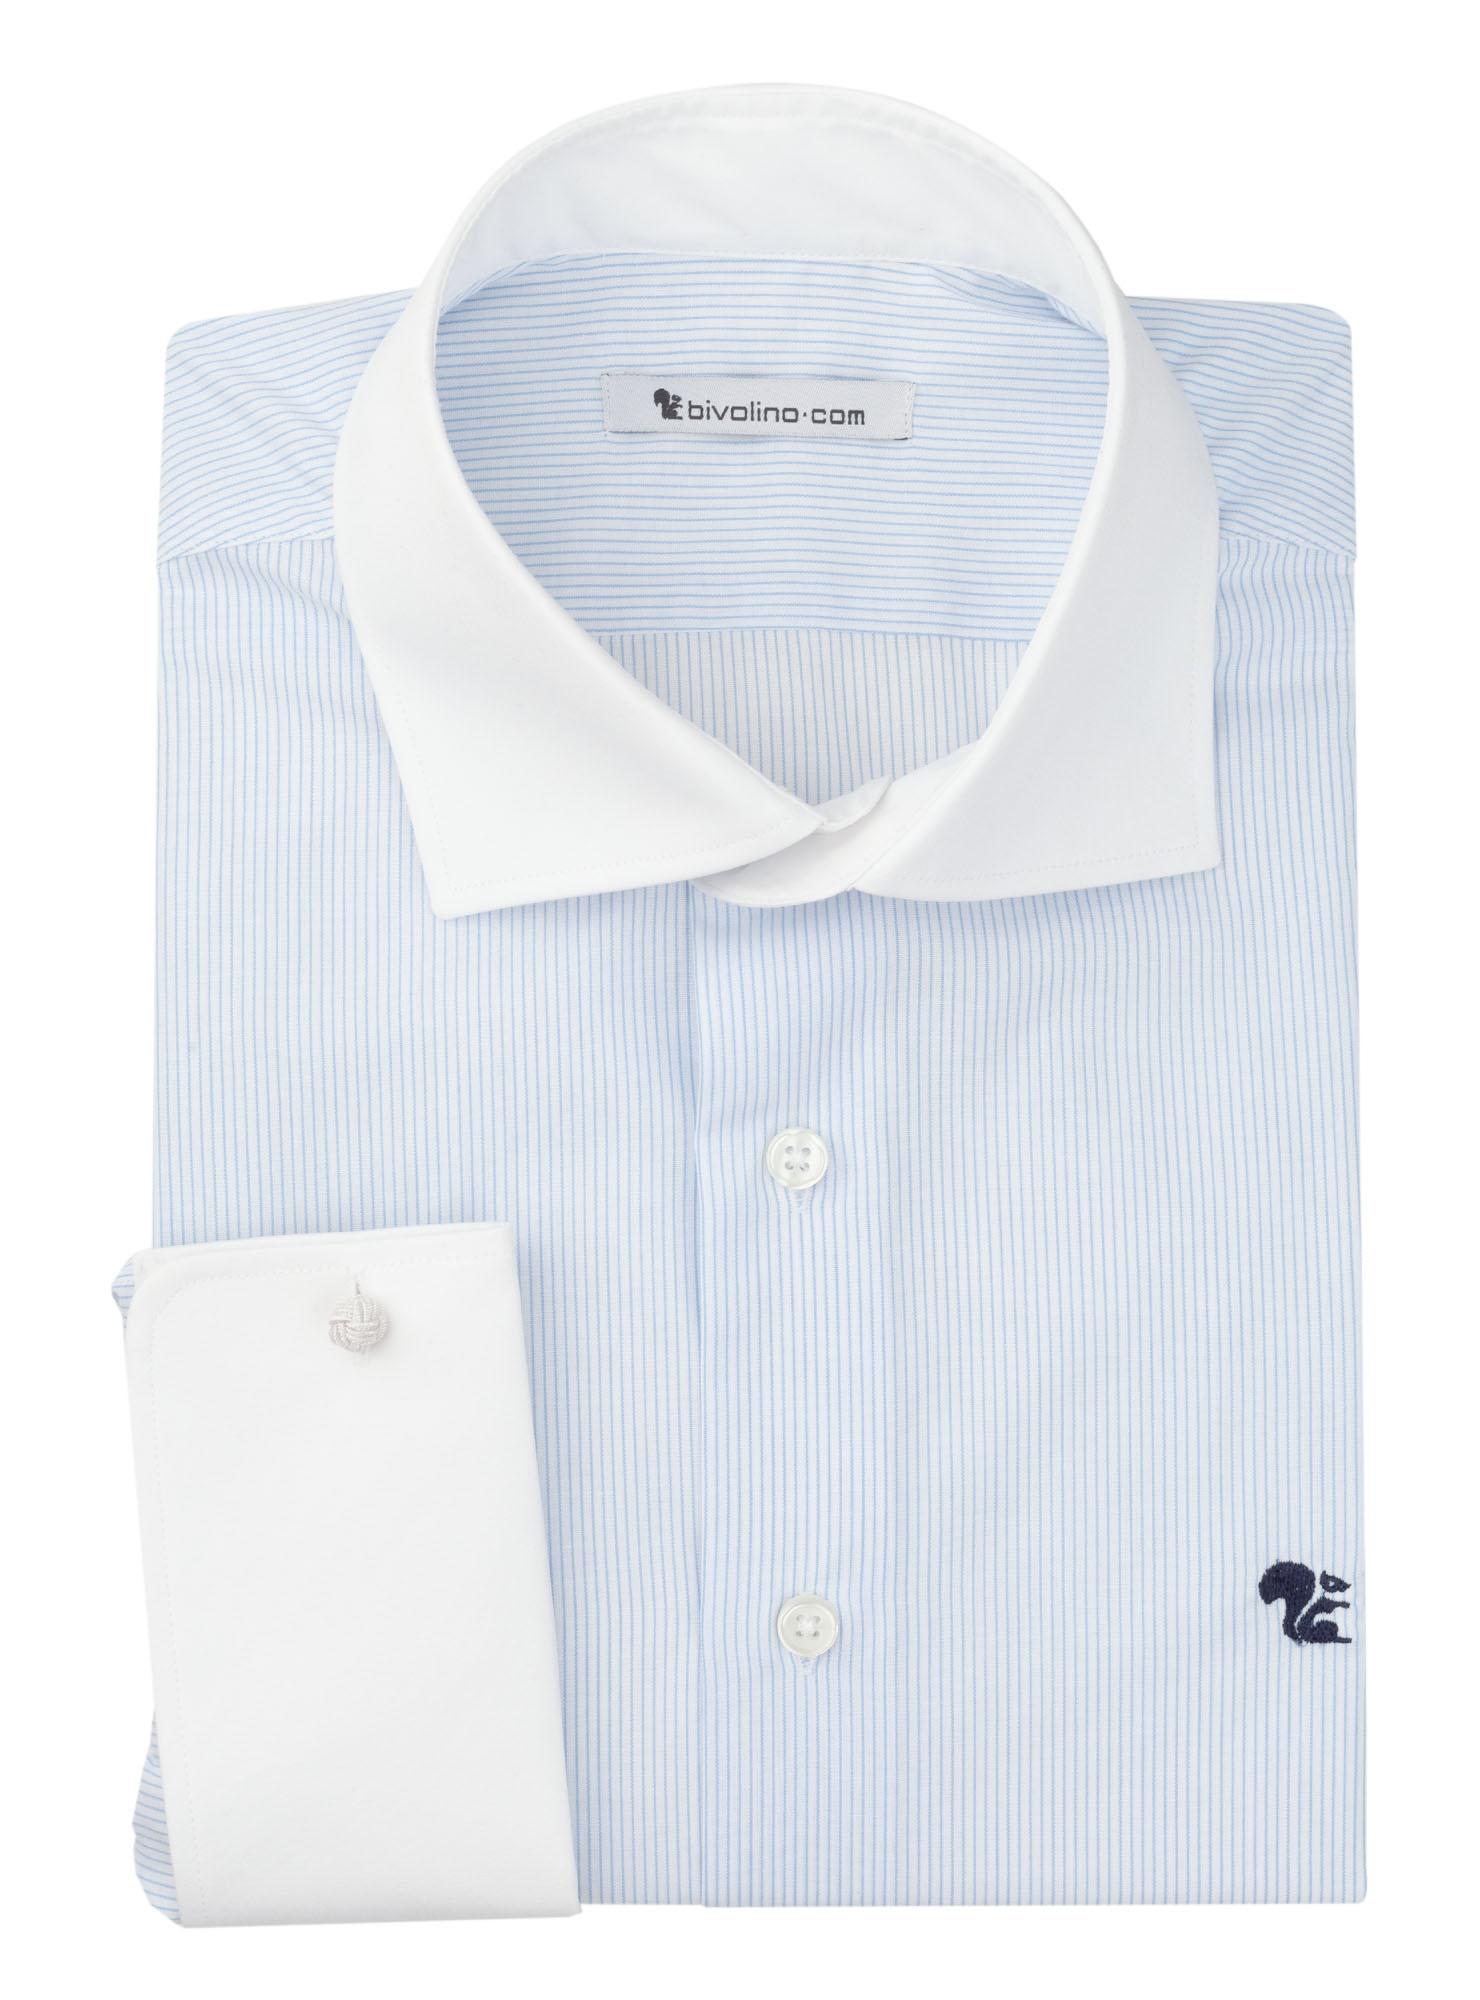 BARI - cot-mix Streifen business blau Herren WINCHESTER Hemd - BOREO 2